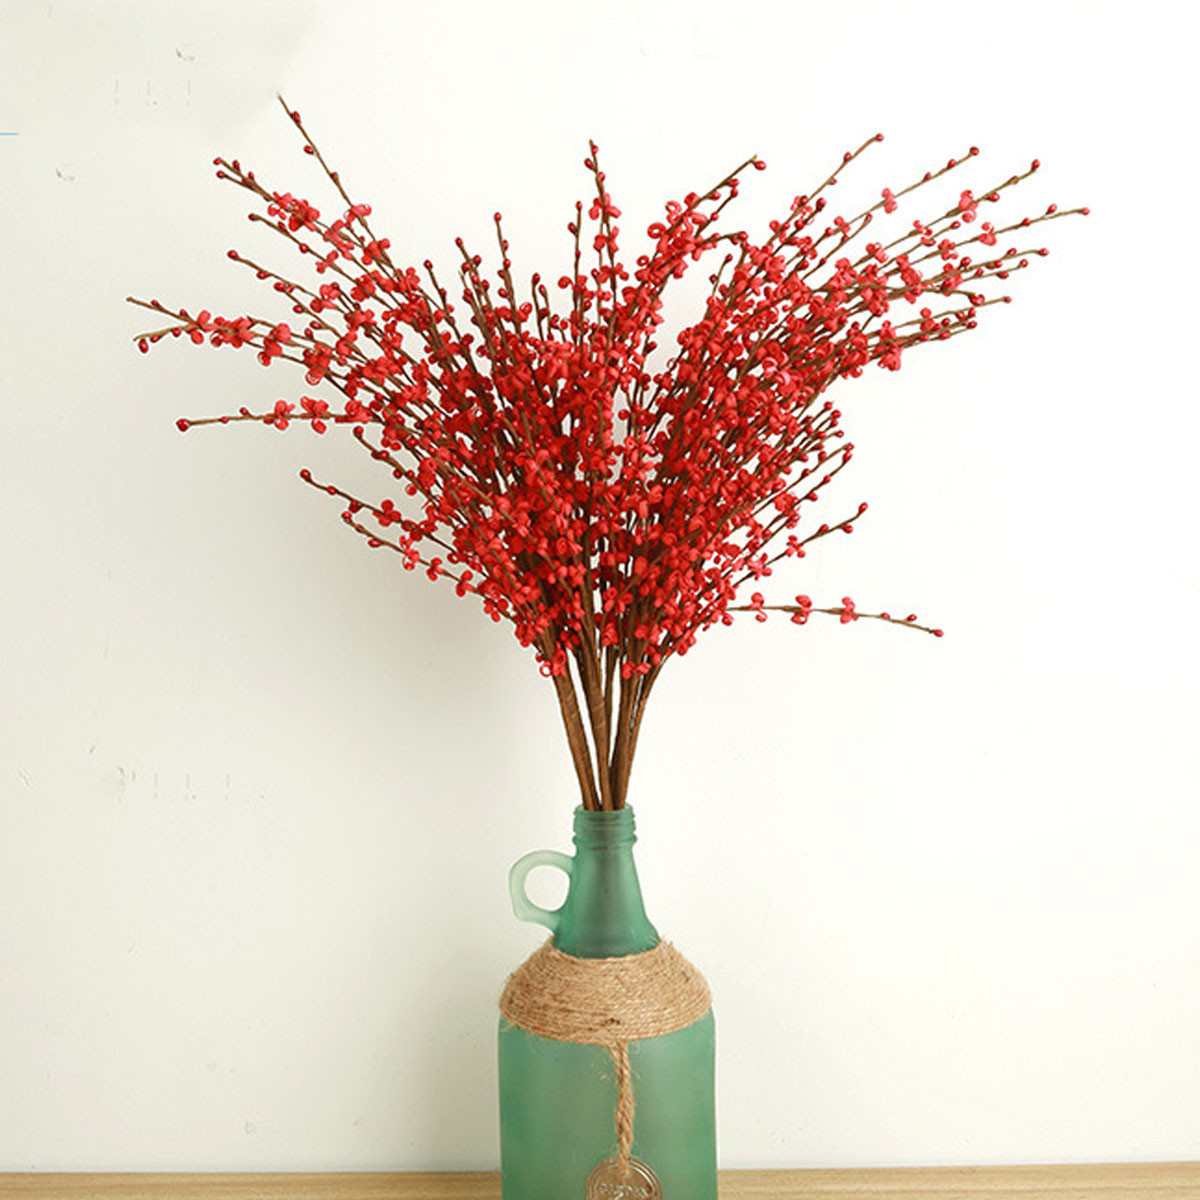 1 buah rumah palsu buatan anggrek bunga sutra pesta pengantin & dekorasi taman kamar Weddding Merah - Internasional